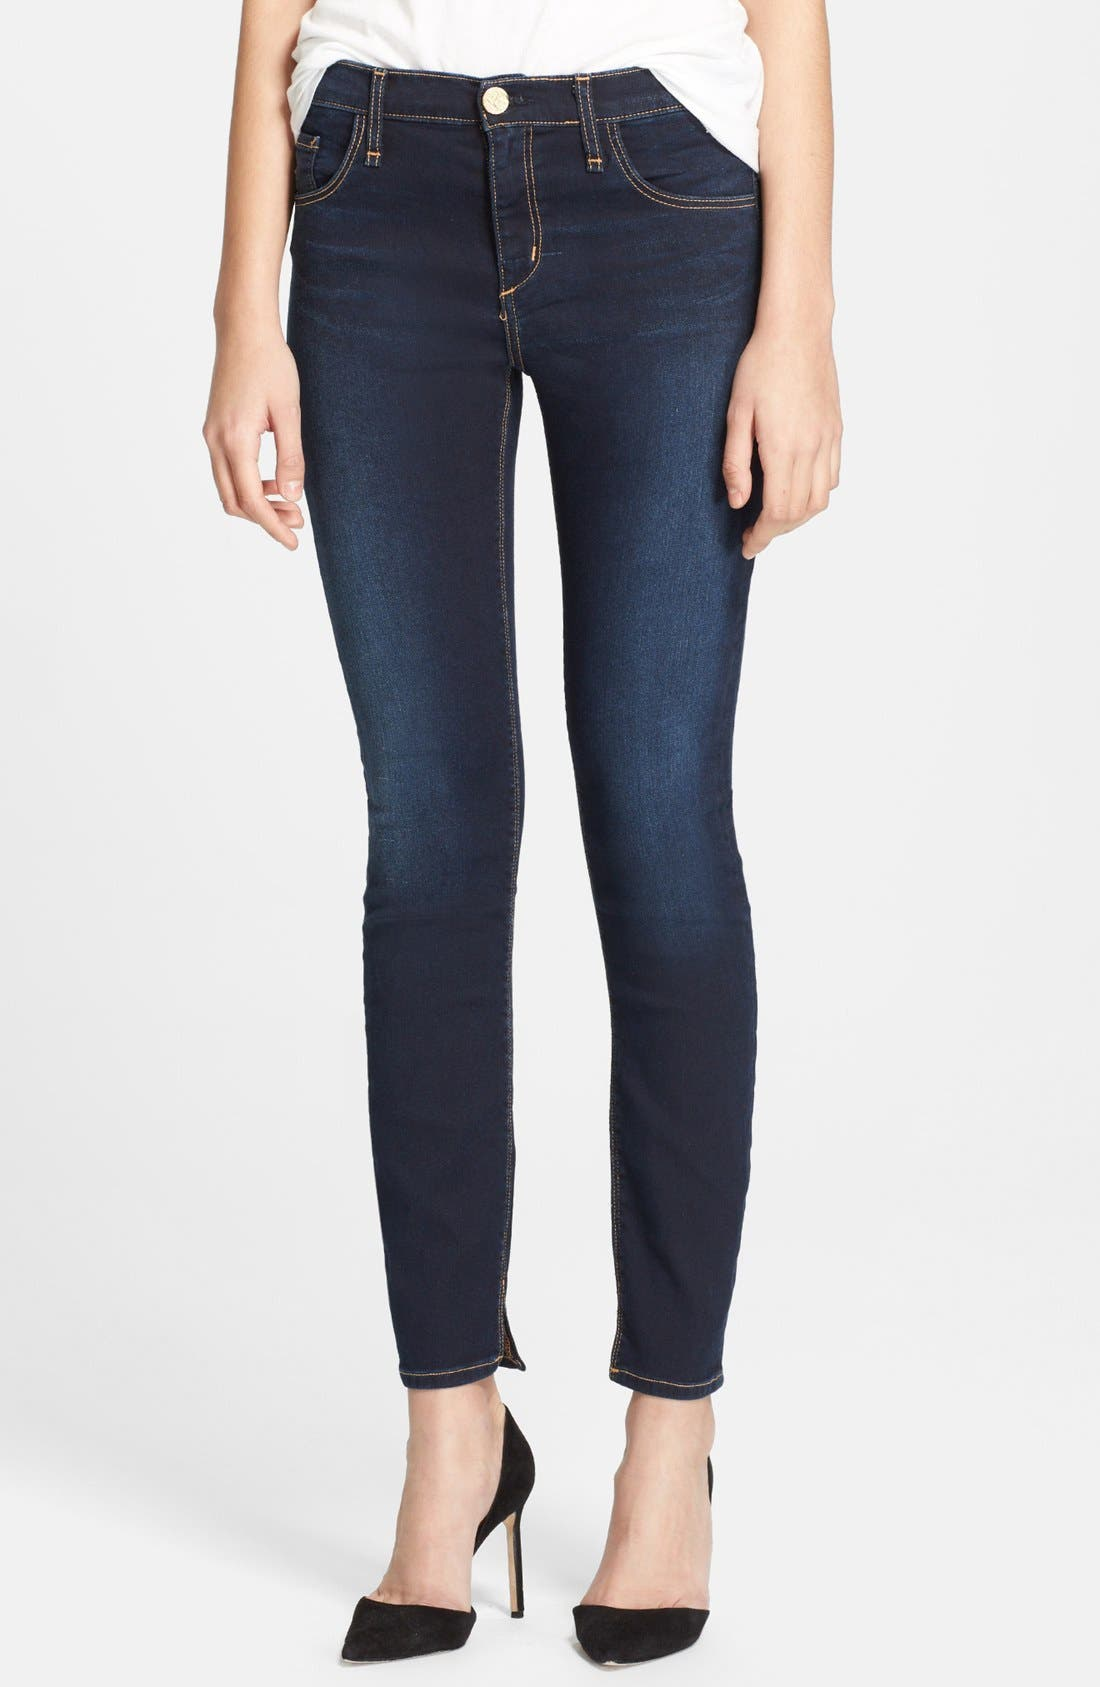 Alternate Image 1 Selected - McGuire Skinny Ankle Jeans (Atlantic Blue)